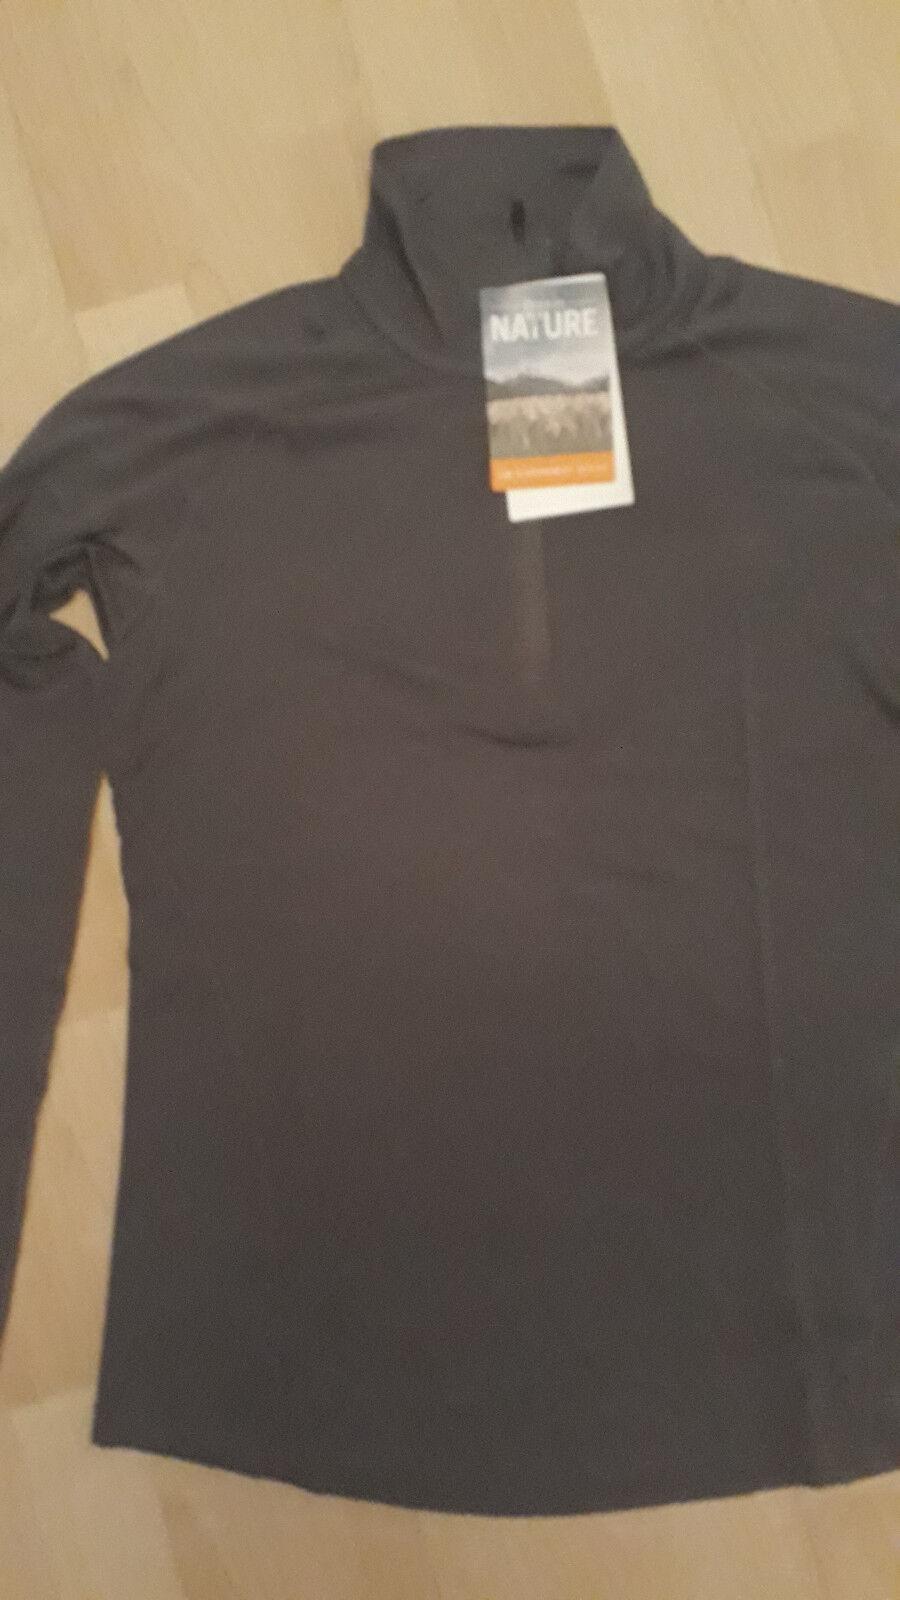 NEU Icebreaker Zeal LS Half Zip Shirt Damens  Metall Gr. L in grau/ Metall  013e3b